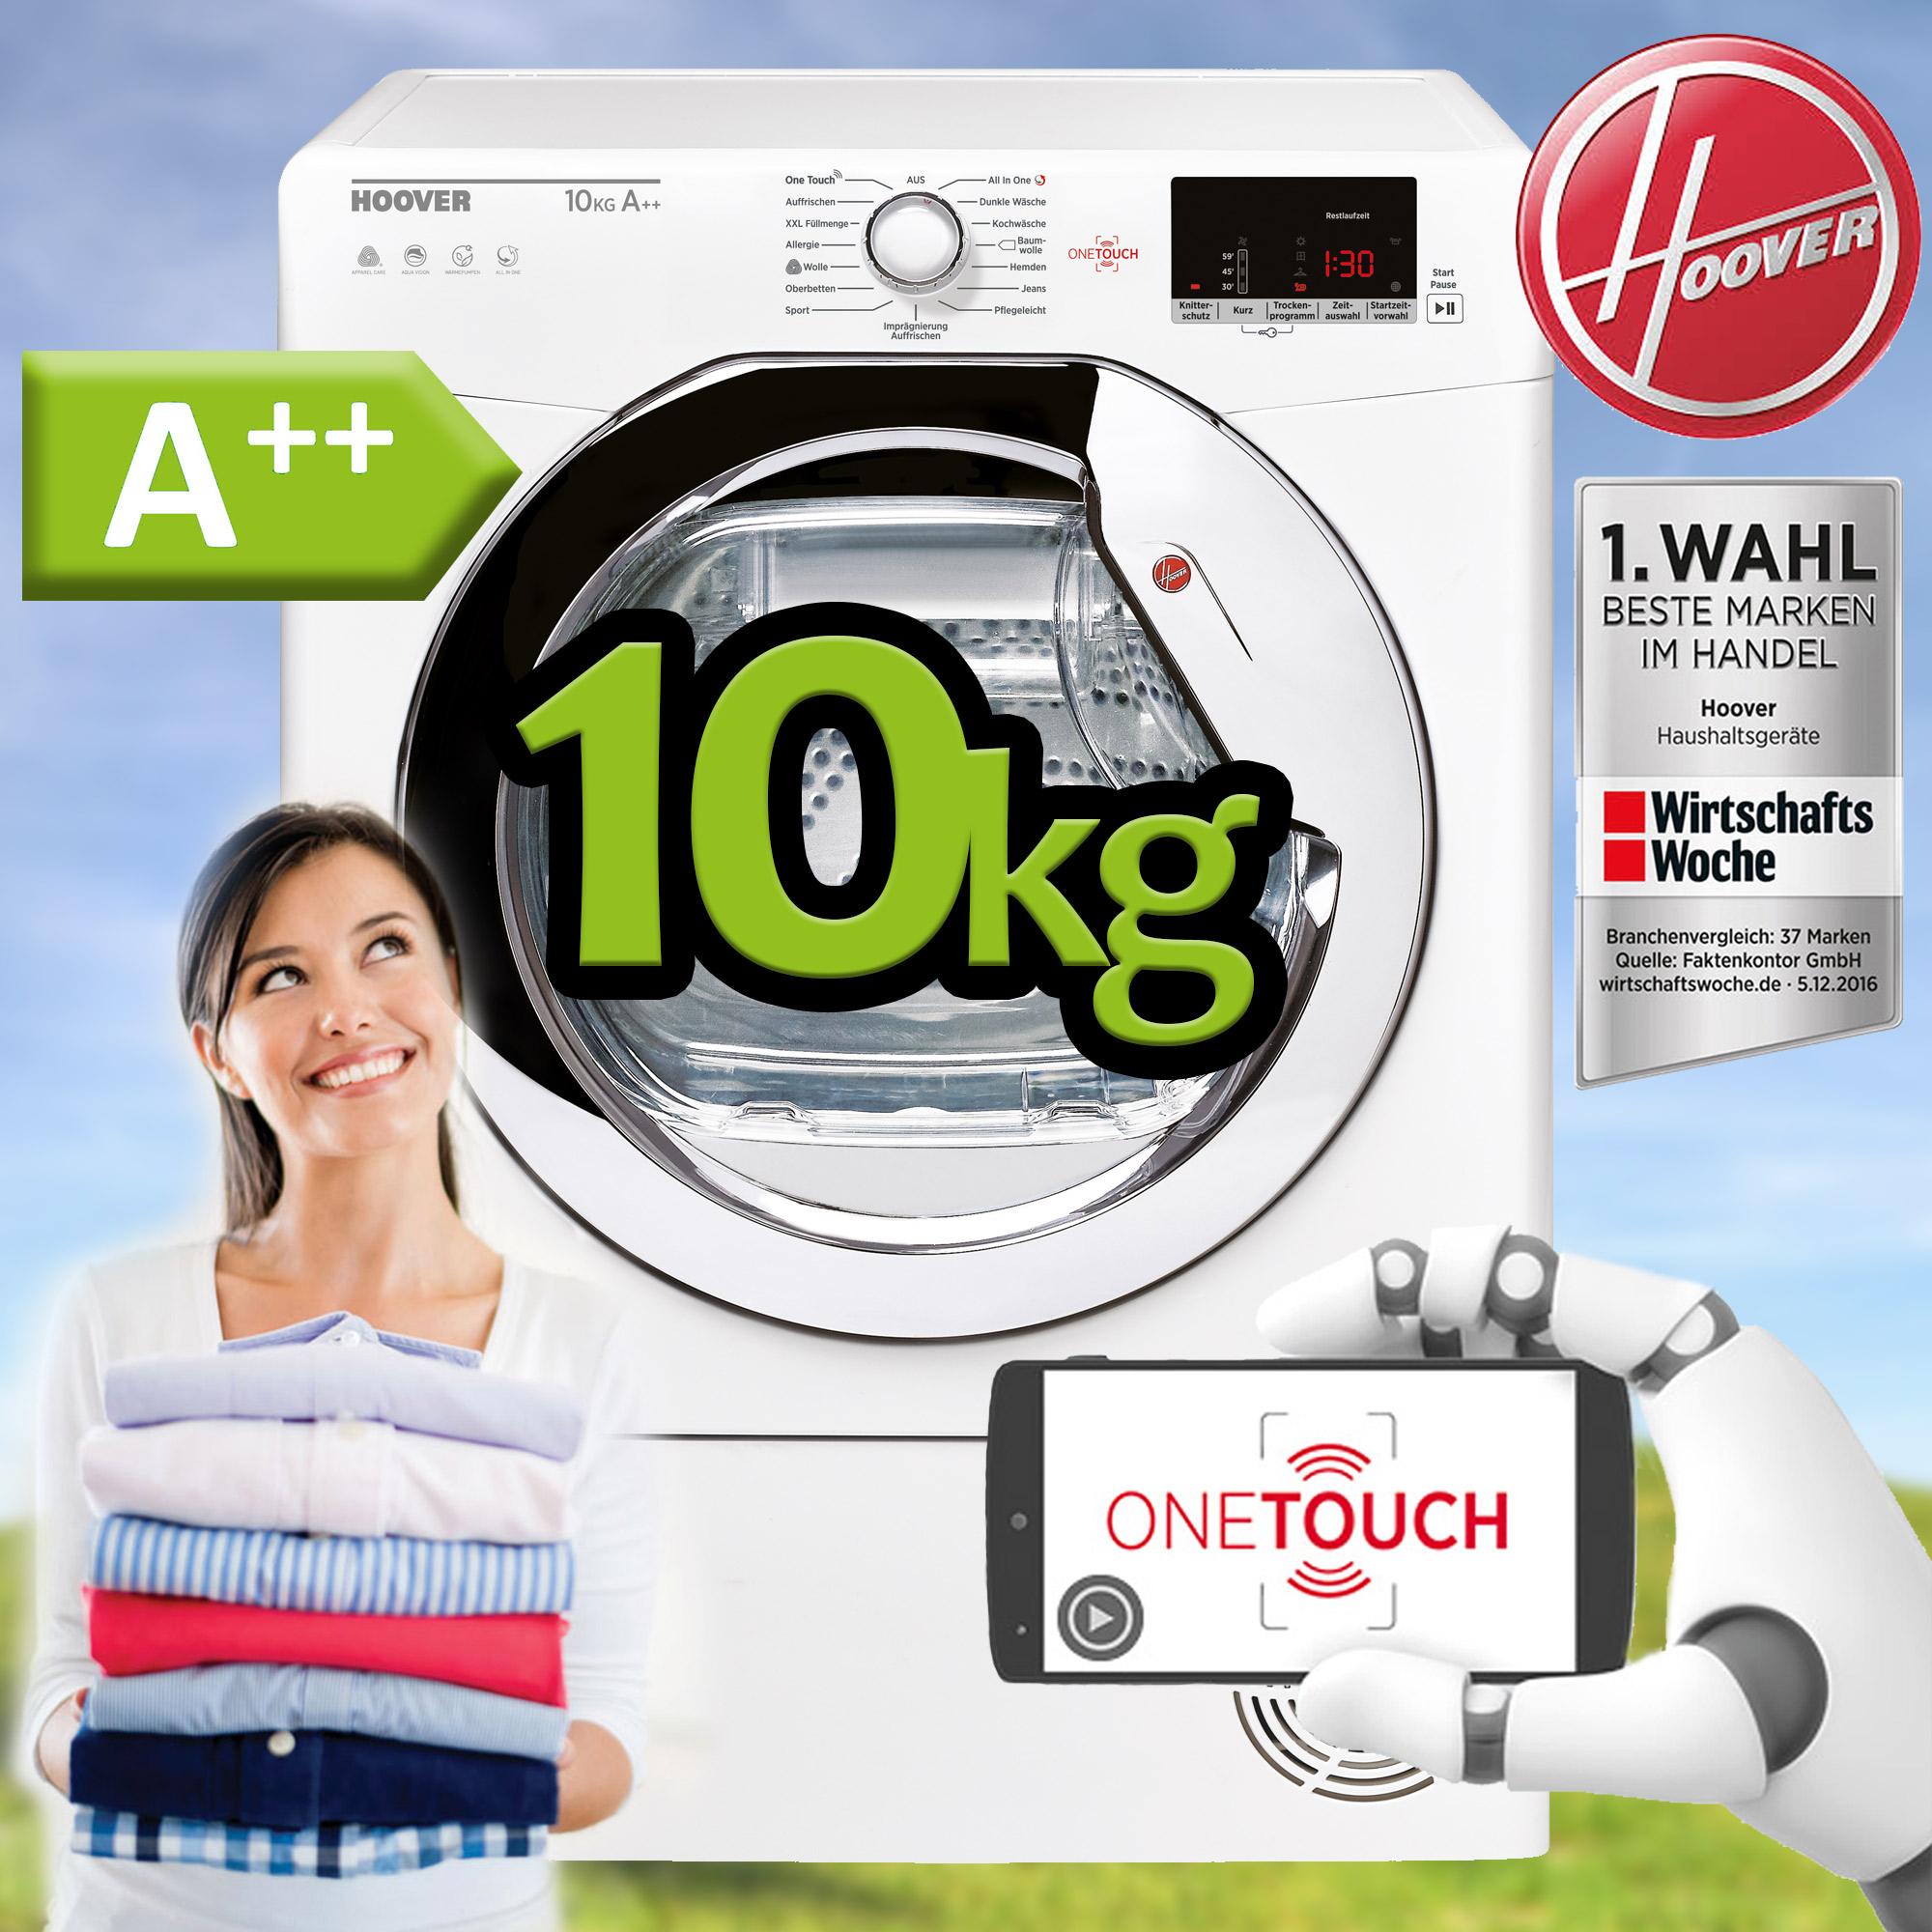 Candy 7kg Wärmepumpentrockner Kondenstrockner NFC-Steuerung Knitterschutz A++